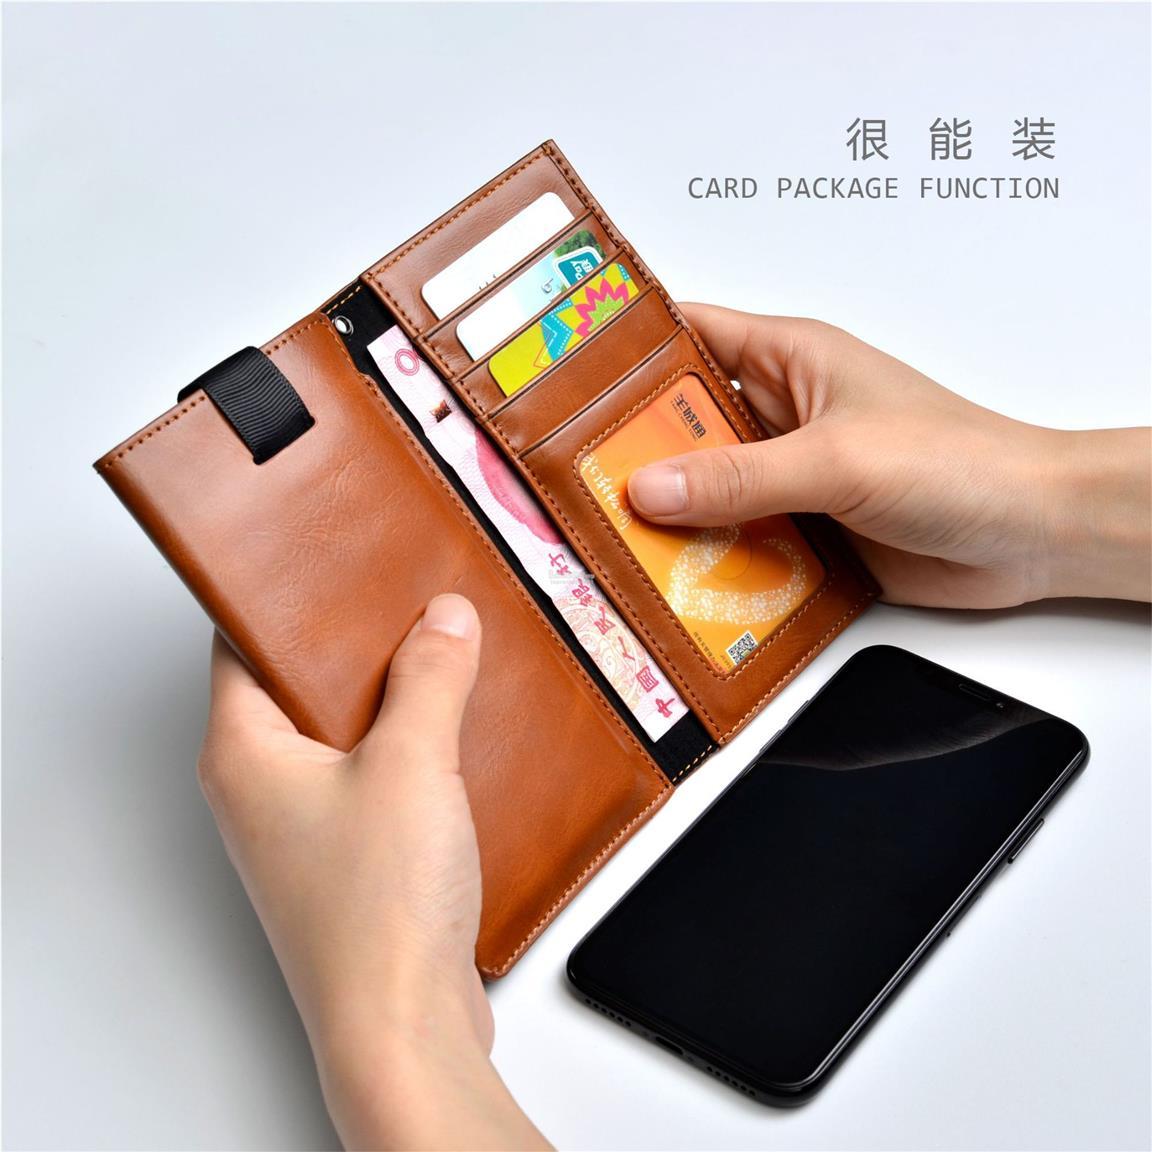 designer fashion b7653 64020 PULOKA Apple iPhone X 7 8 Plus Flip Card Slot Wallet Case Cover Casing